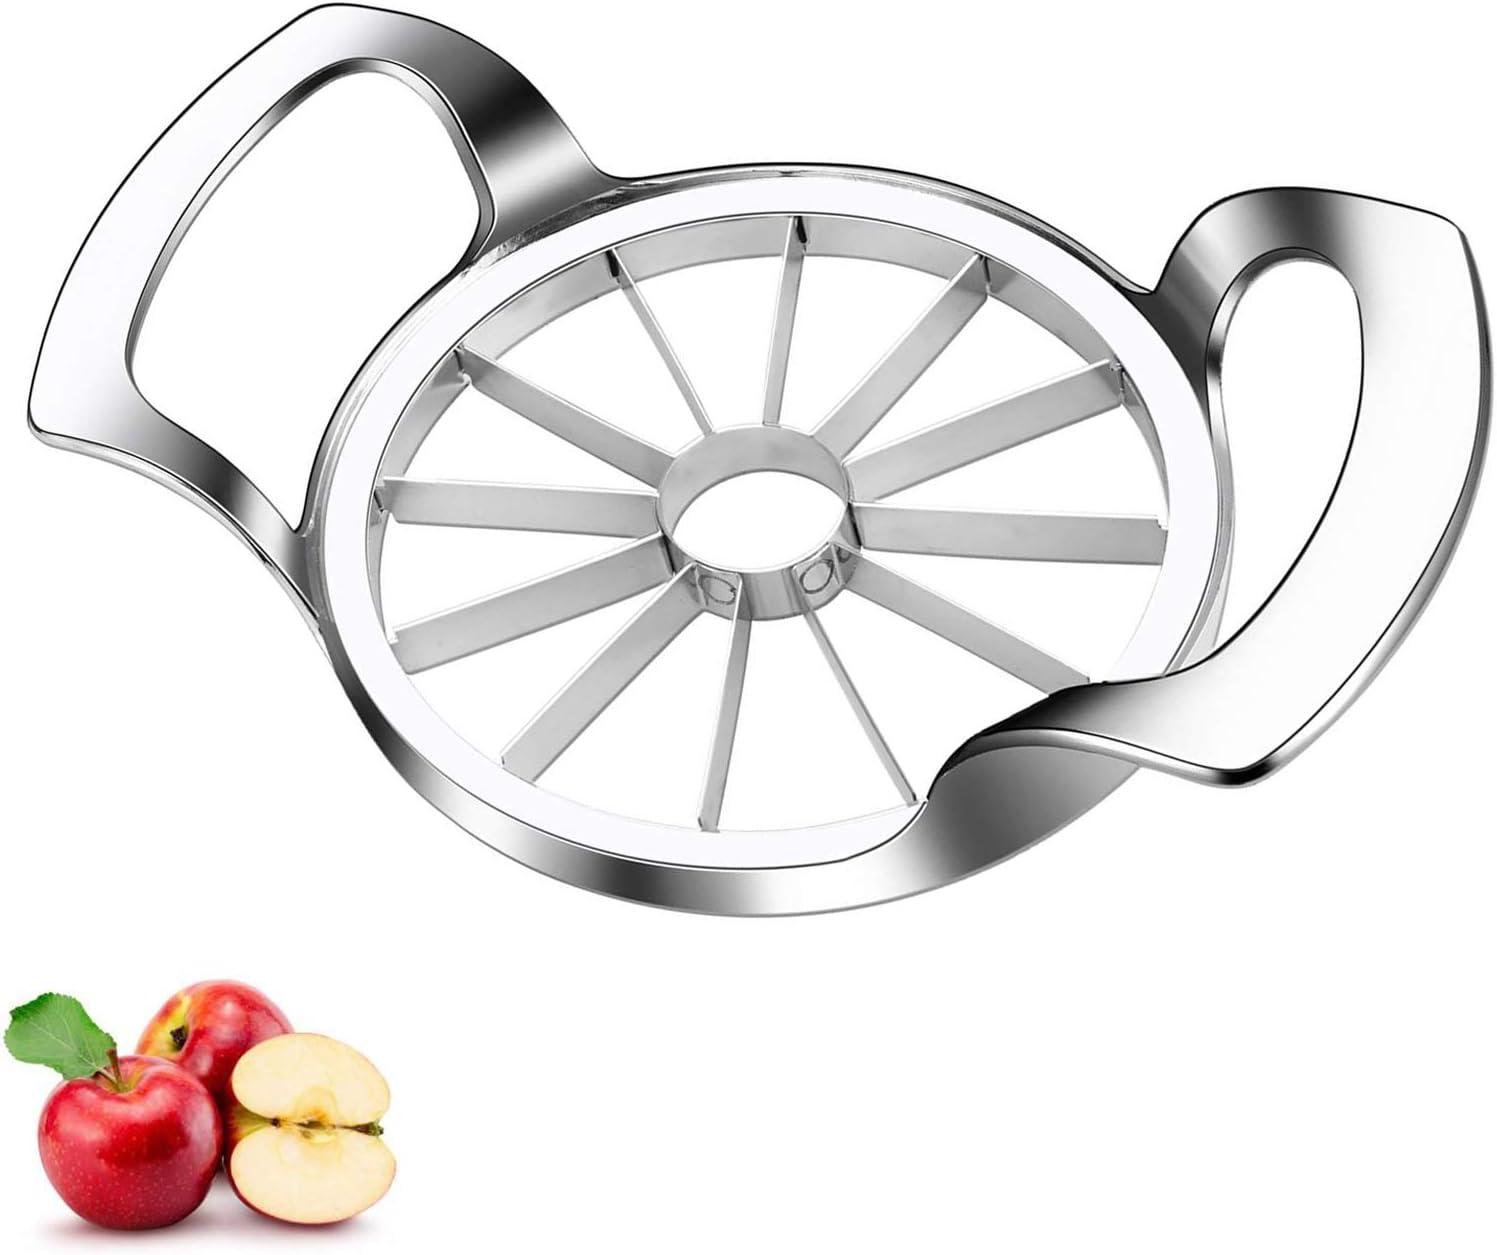 Apple Slicer DAOQI 12-Blade Apple Cutter, Upgraded Version Apple Corer and Divider, Stainless Steel Ultra-Sharp Fruit Apple Cutter Tool